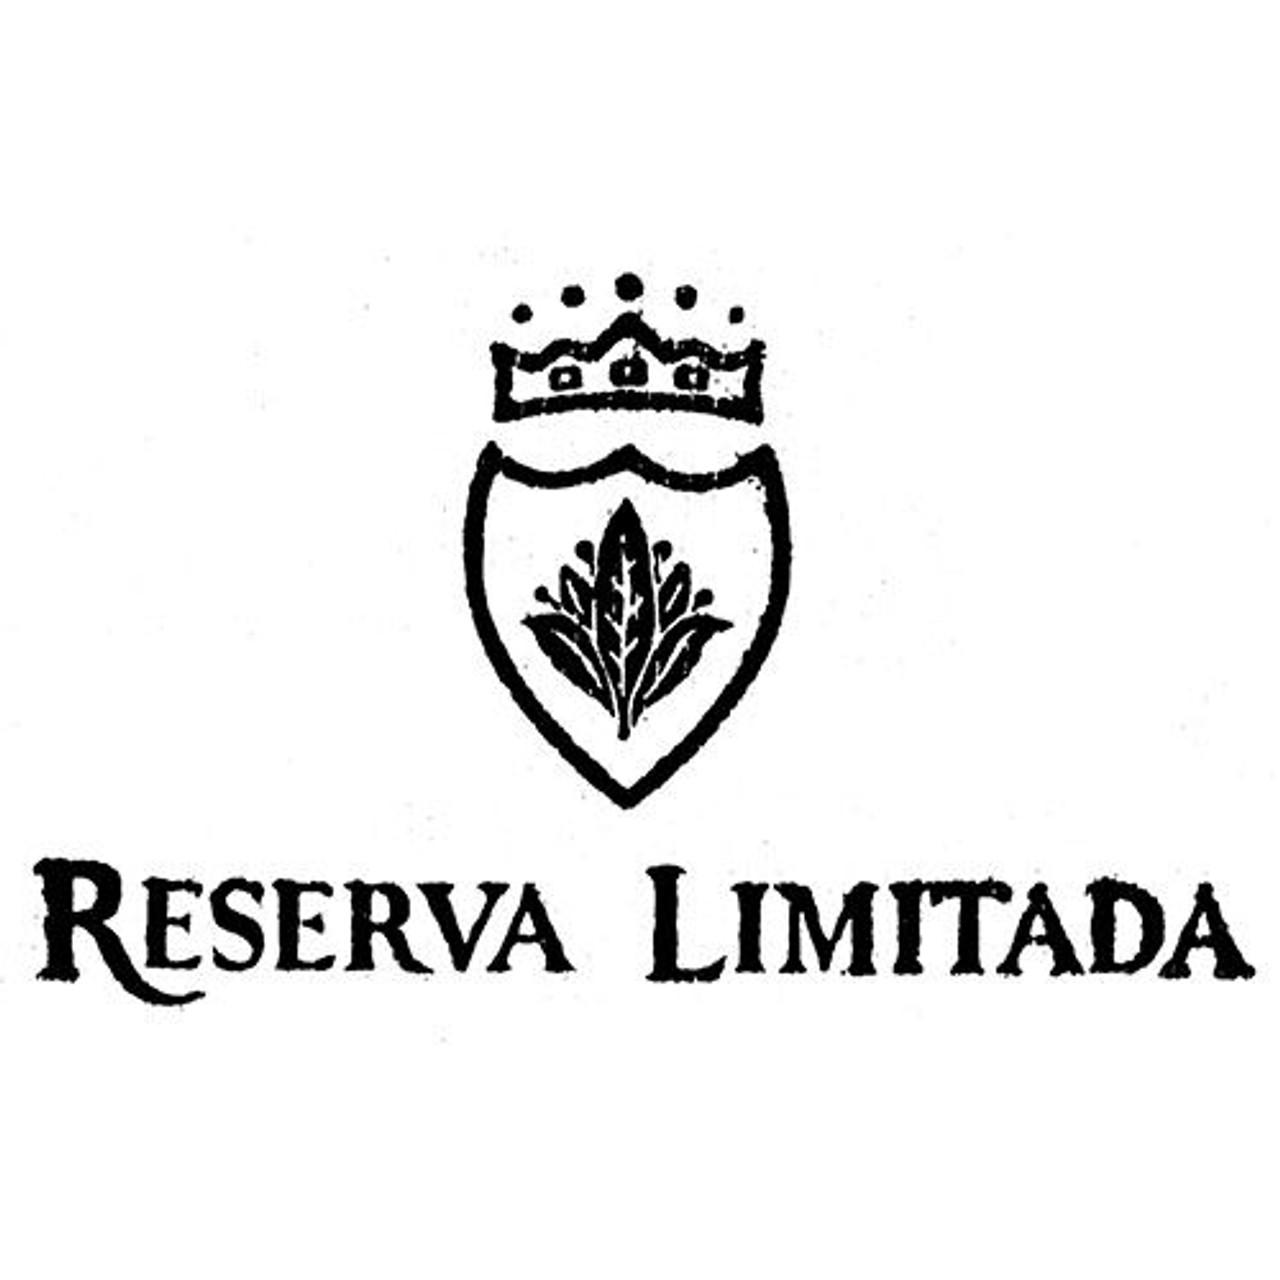 Curivari Reserva Limitada 1000 Series Reserva 4000 Cigars - 6.25 x 54 (Box of 10)